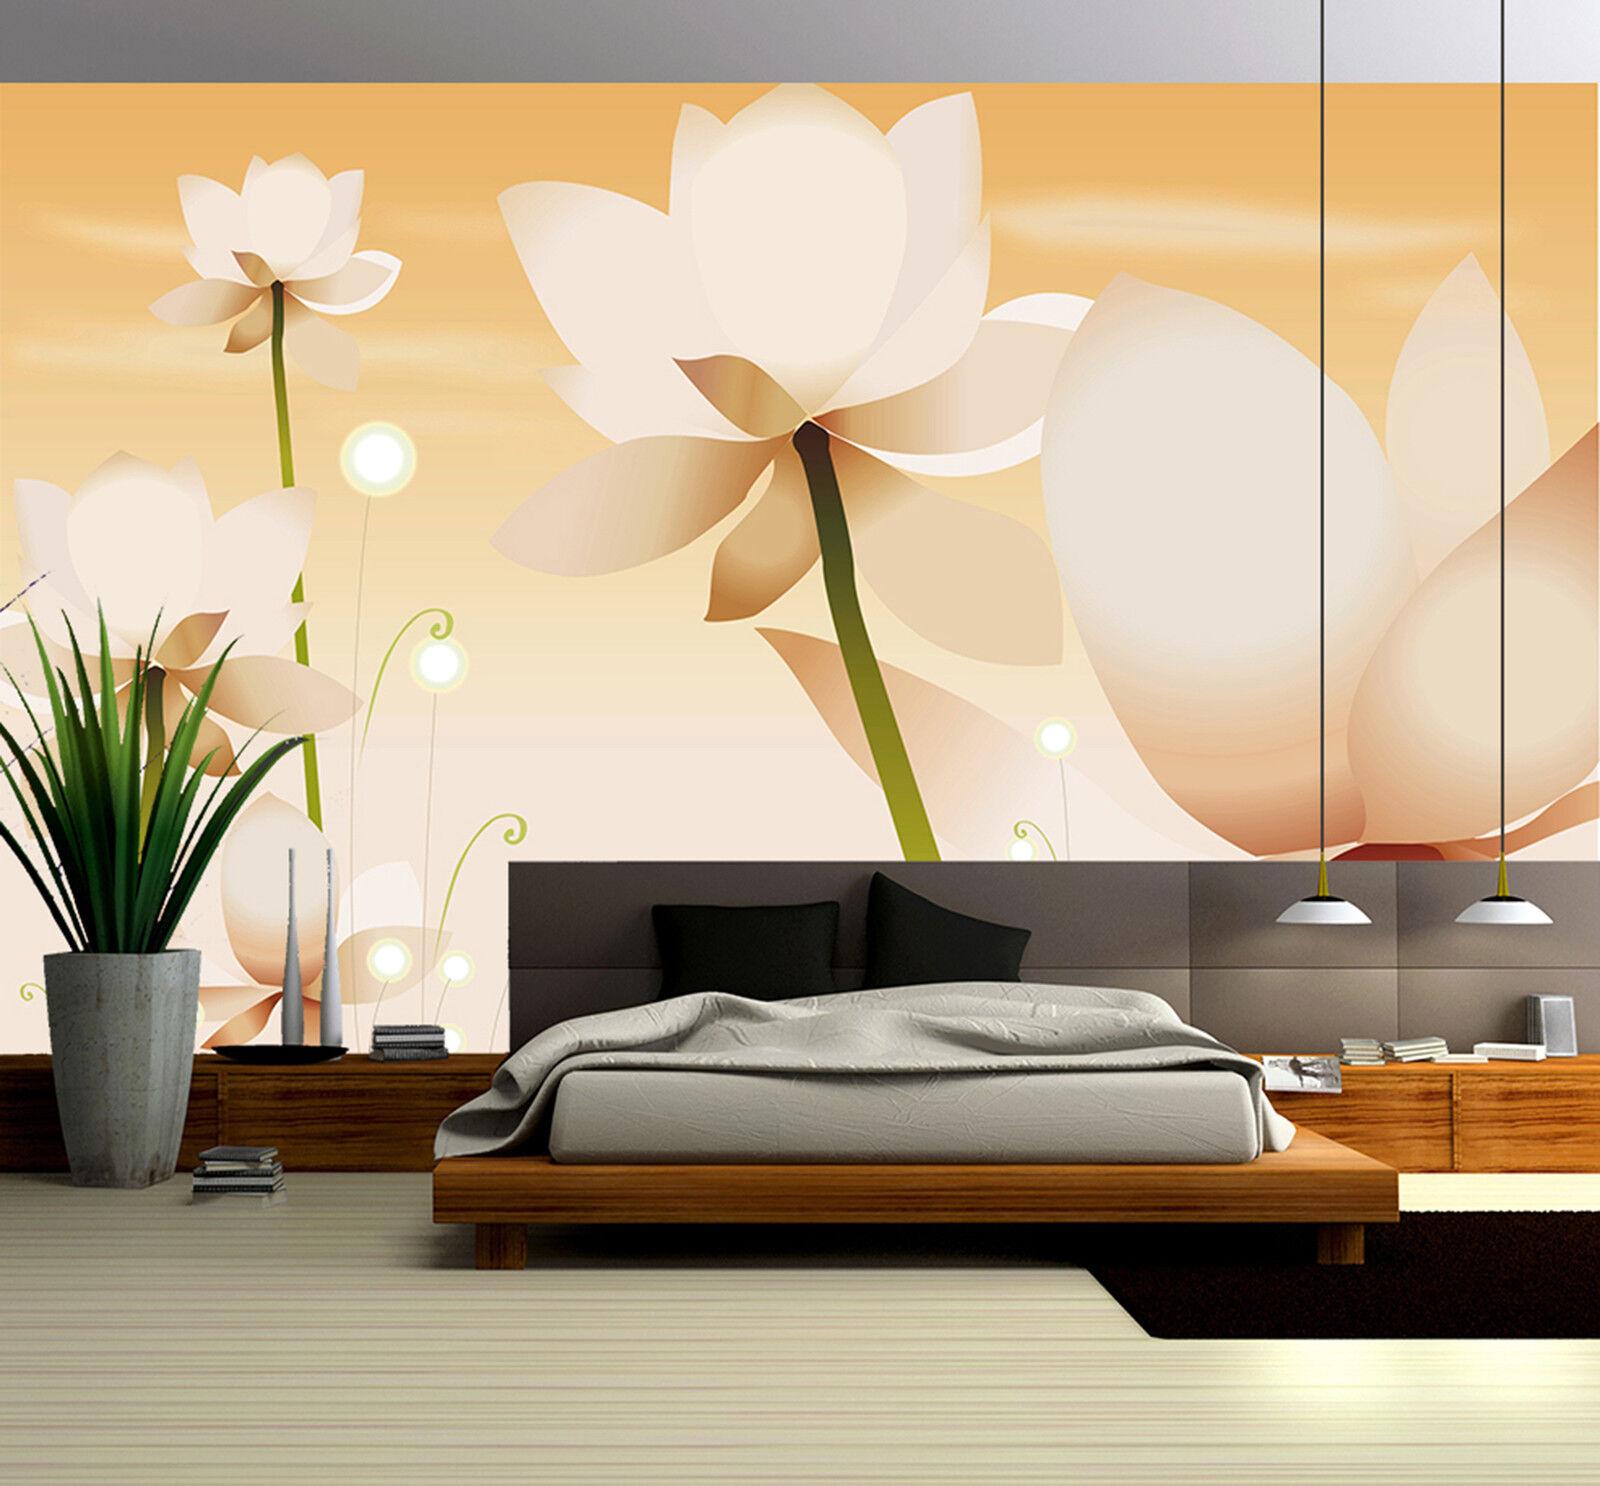 3D Weißer Lotus Fototapeten Wandbild Fototapete Bild Tapete Familie Kinder